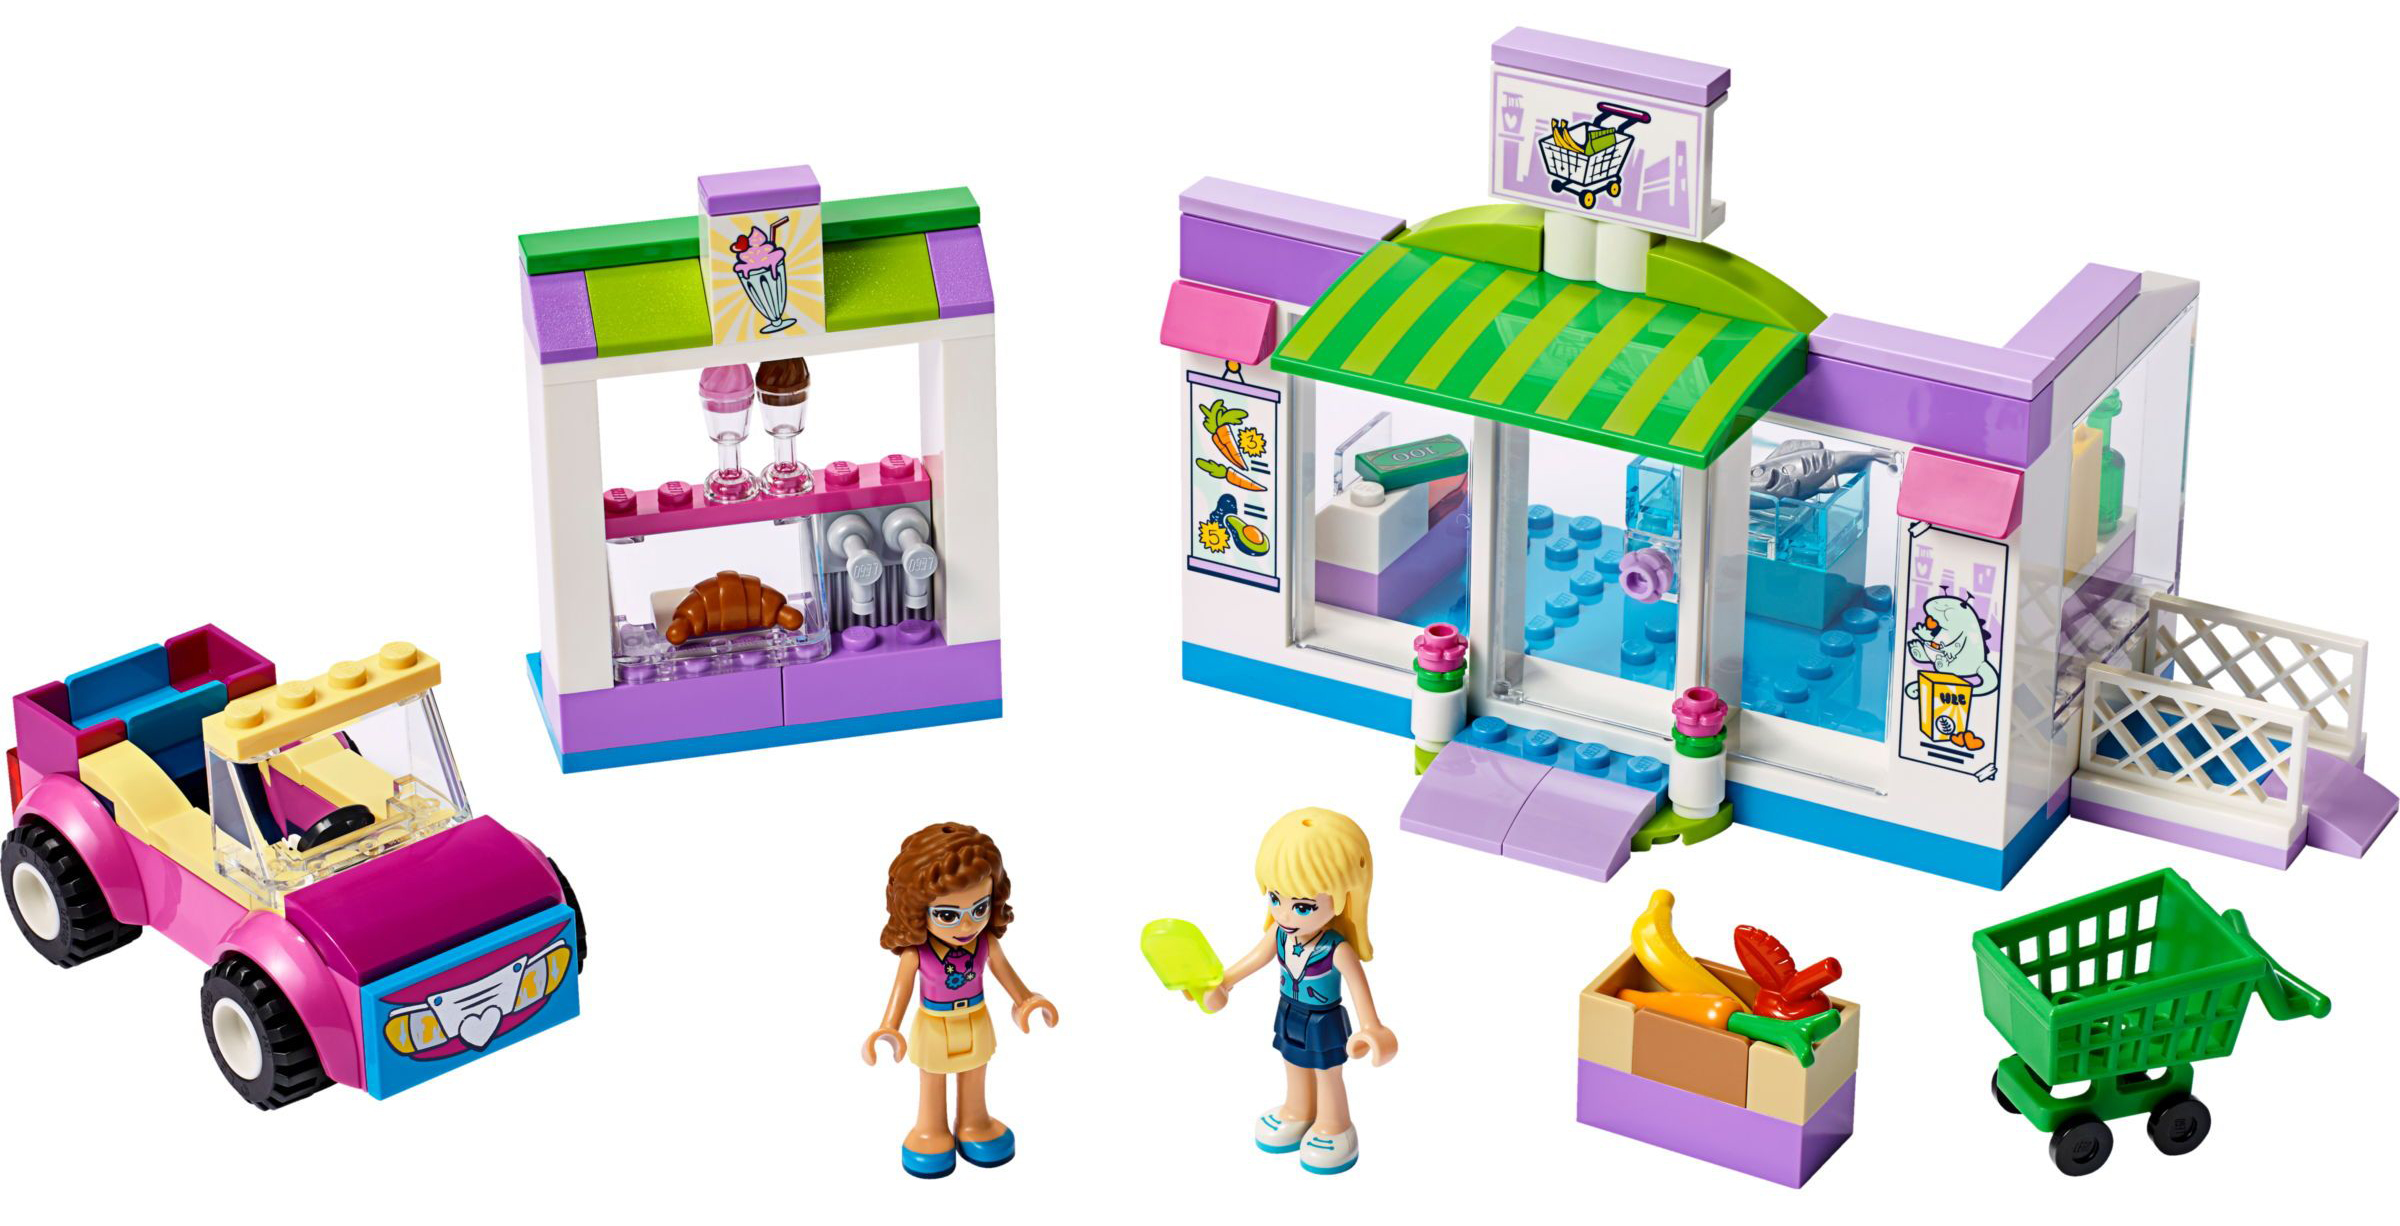 New Lego Friends Summer Set Revealed Bricksfanz